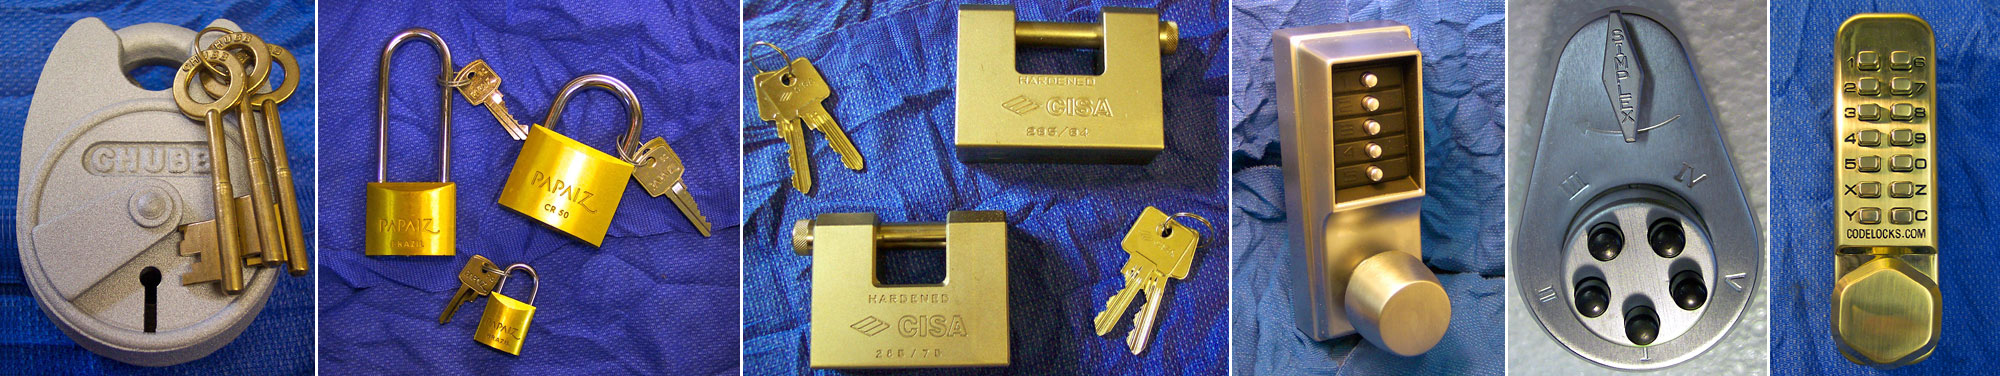 Padlocks, digital locks and code locks